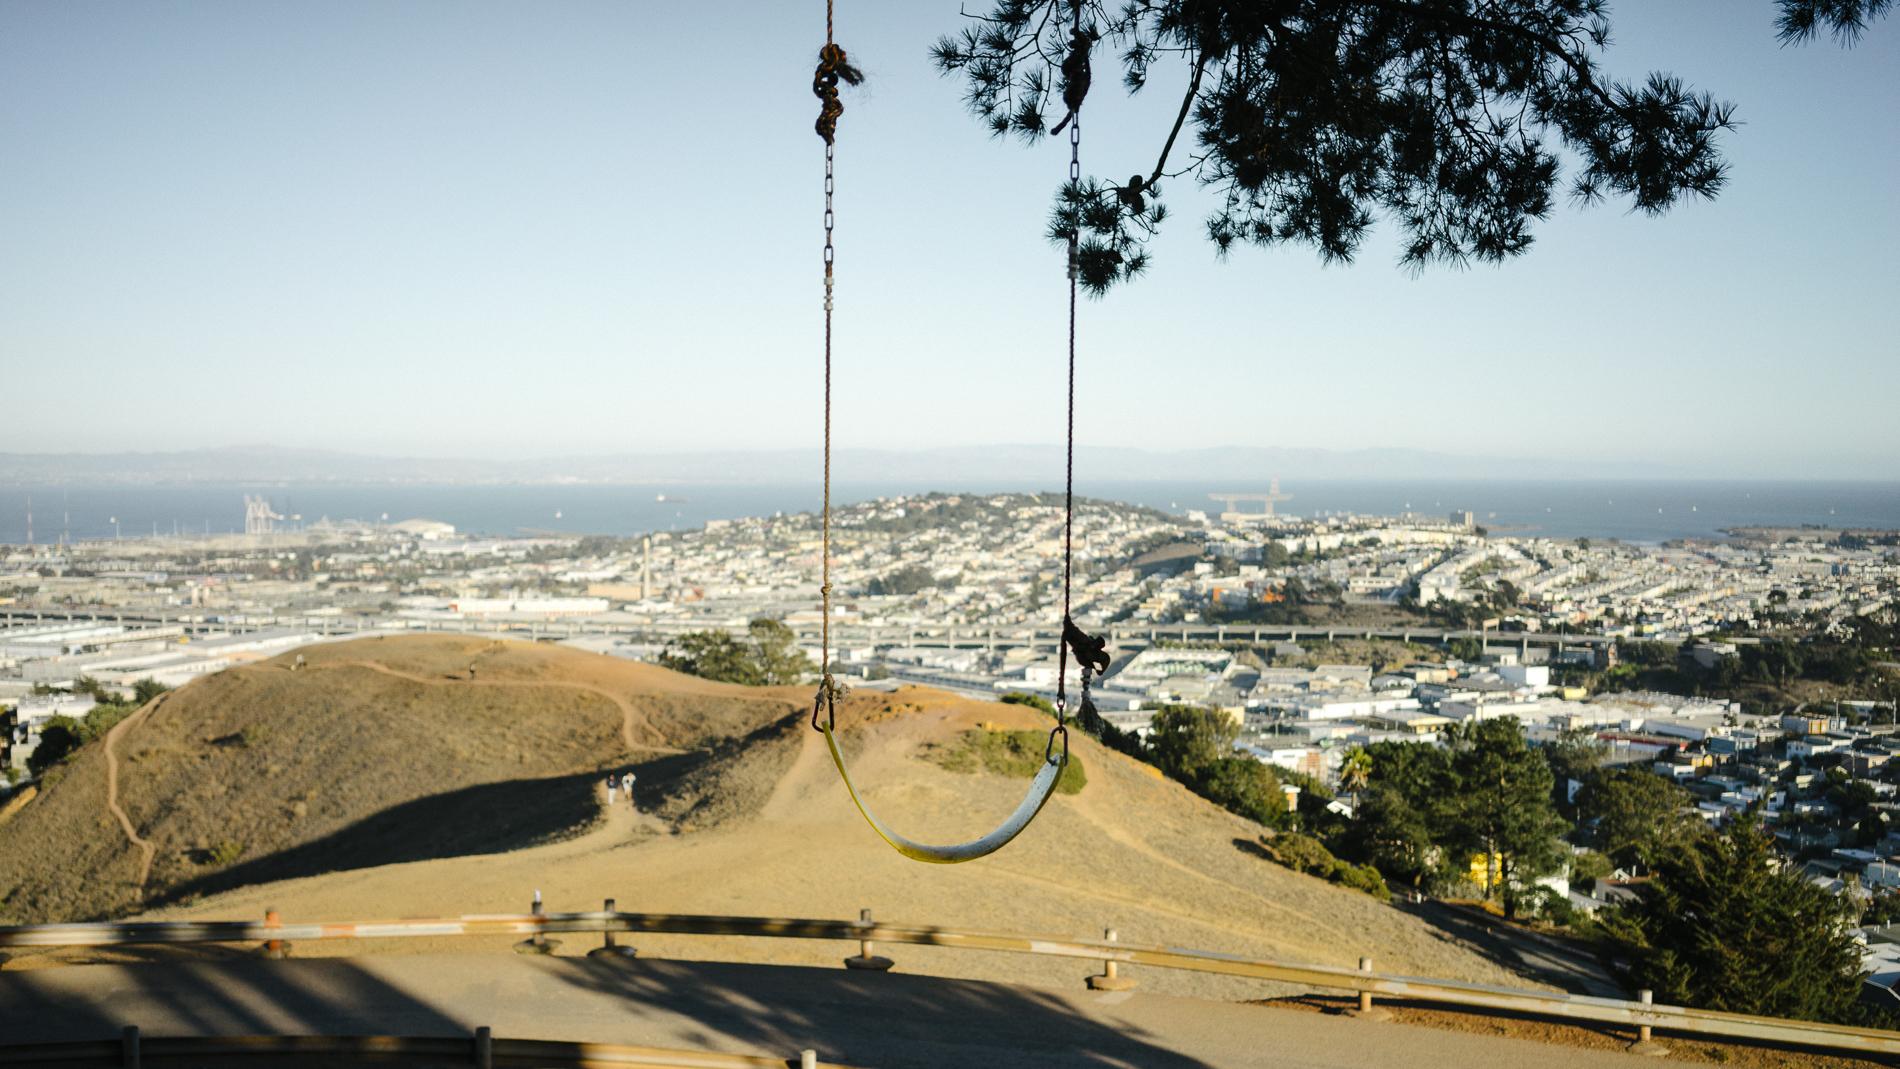 6 reasons to visit San Francisco now | CNN Travel